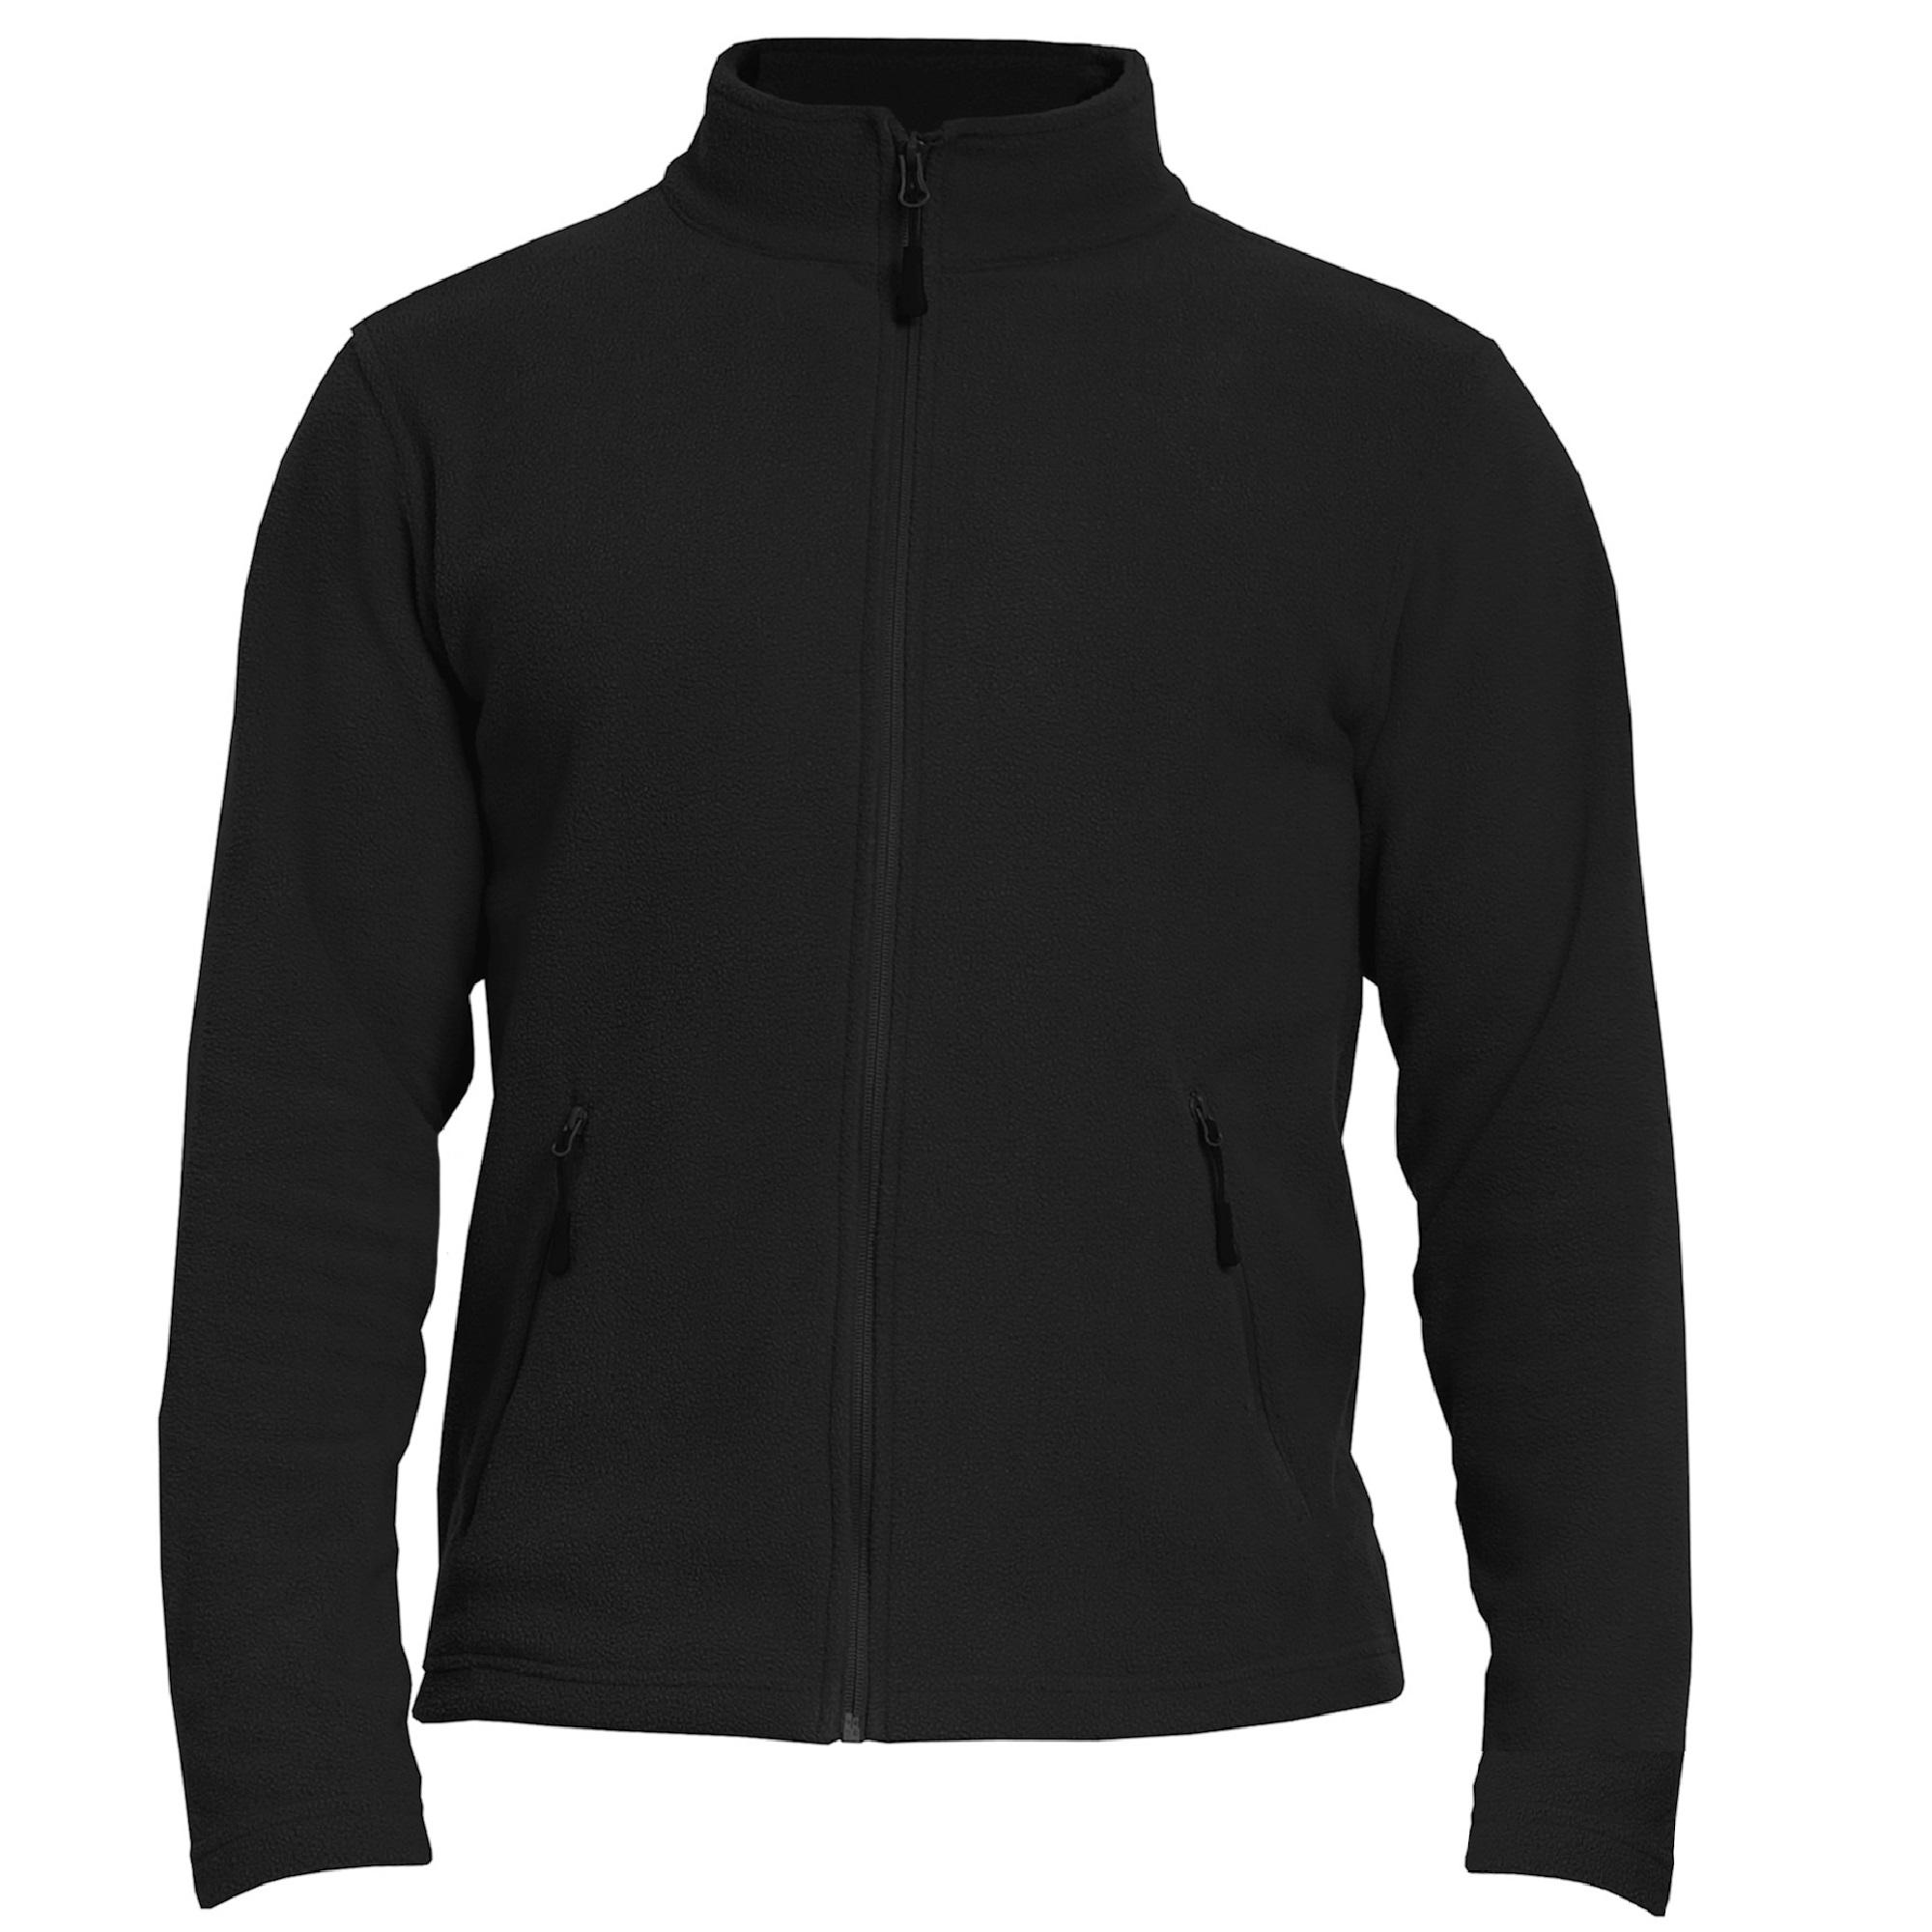 Gildan Adults Unisex Hammer Micro-Fleece Jacket (L) (Black)